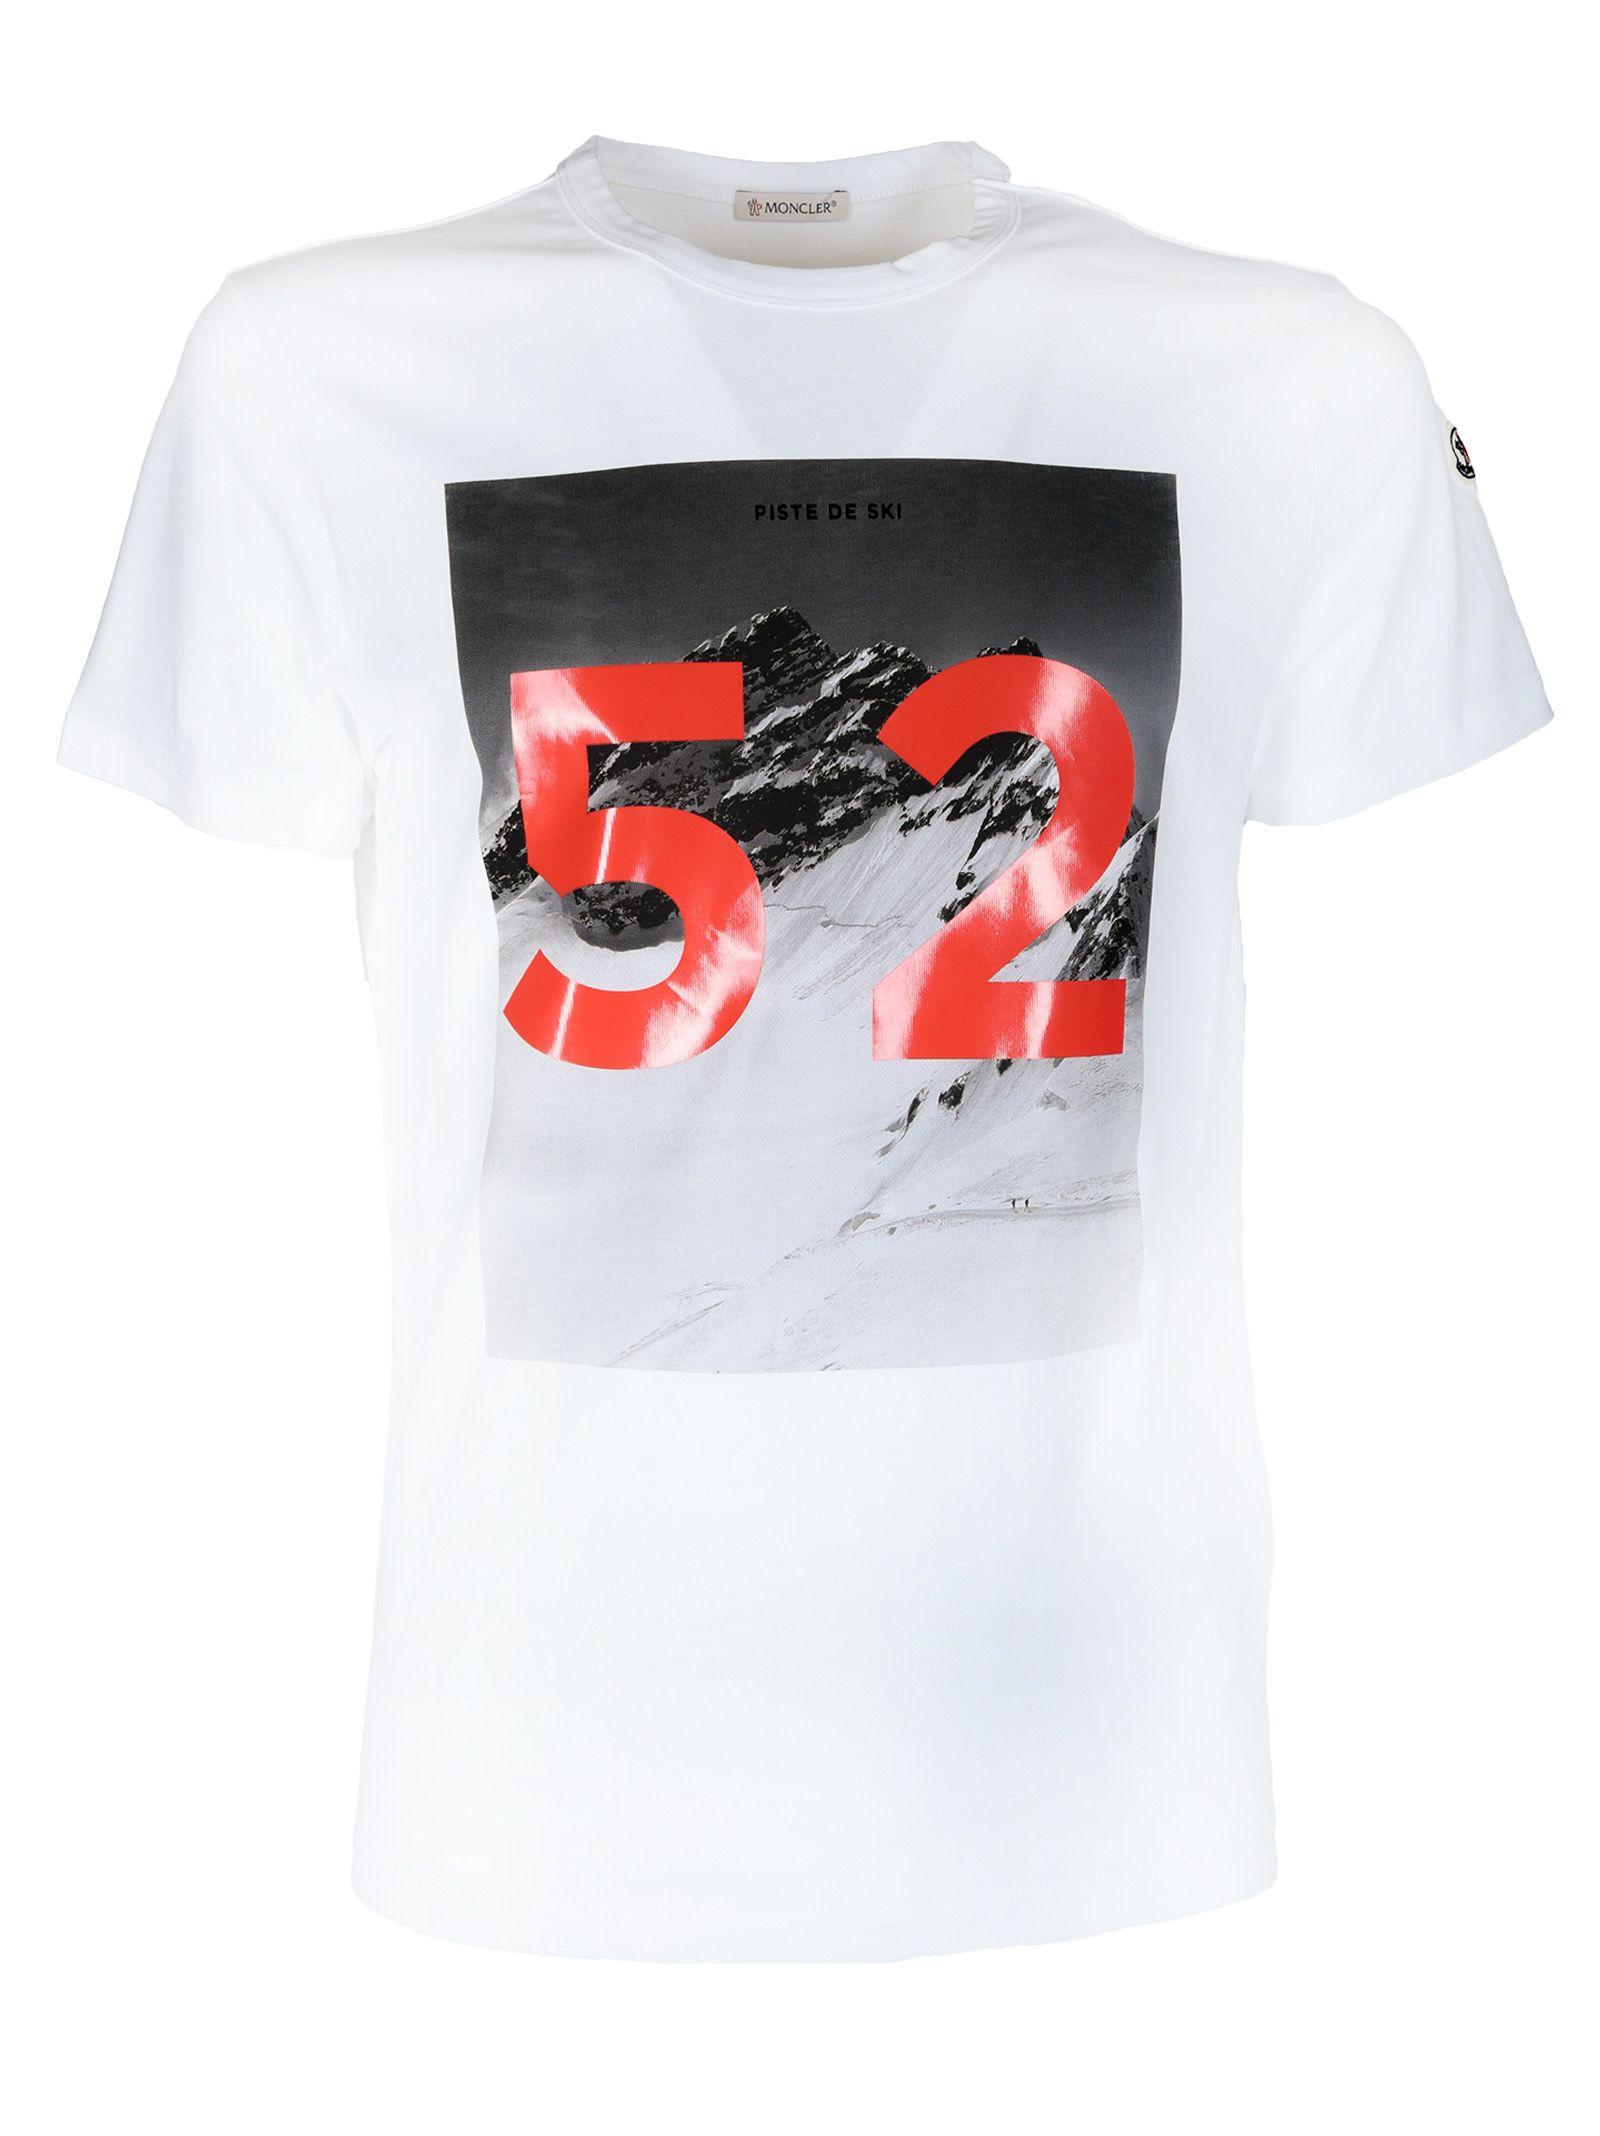 Moncler Graphic Print T-shirt